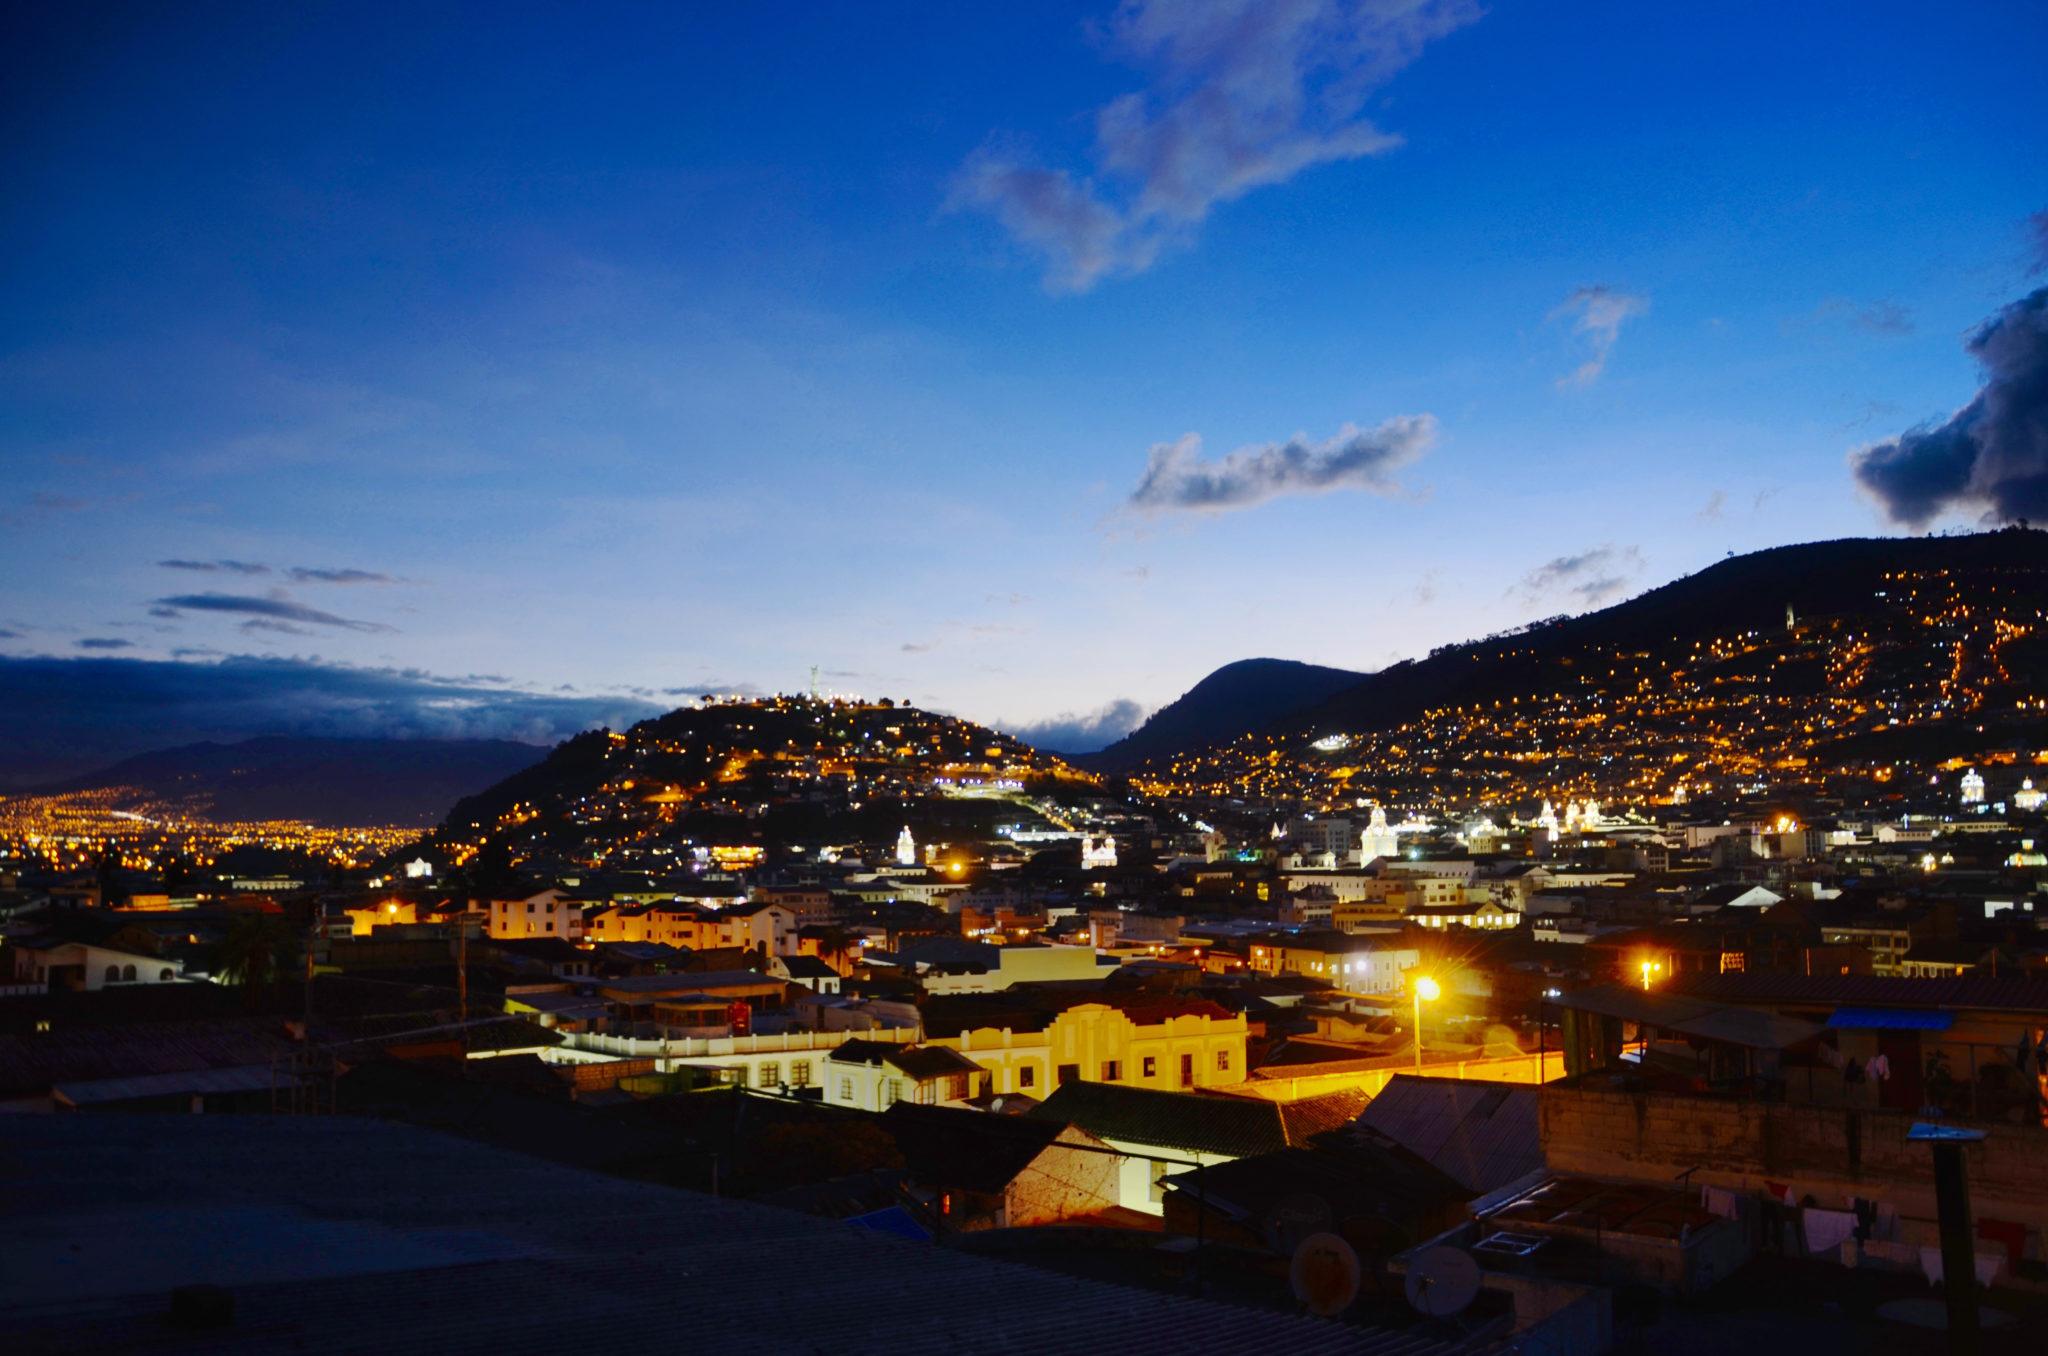 Sehenswuerdigkeiten-Ecuador-Quito-Nacht-Panorama